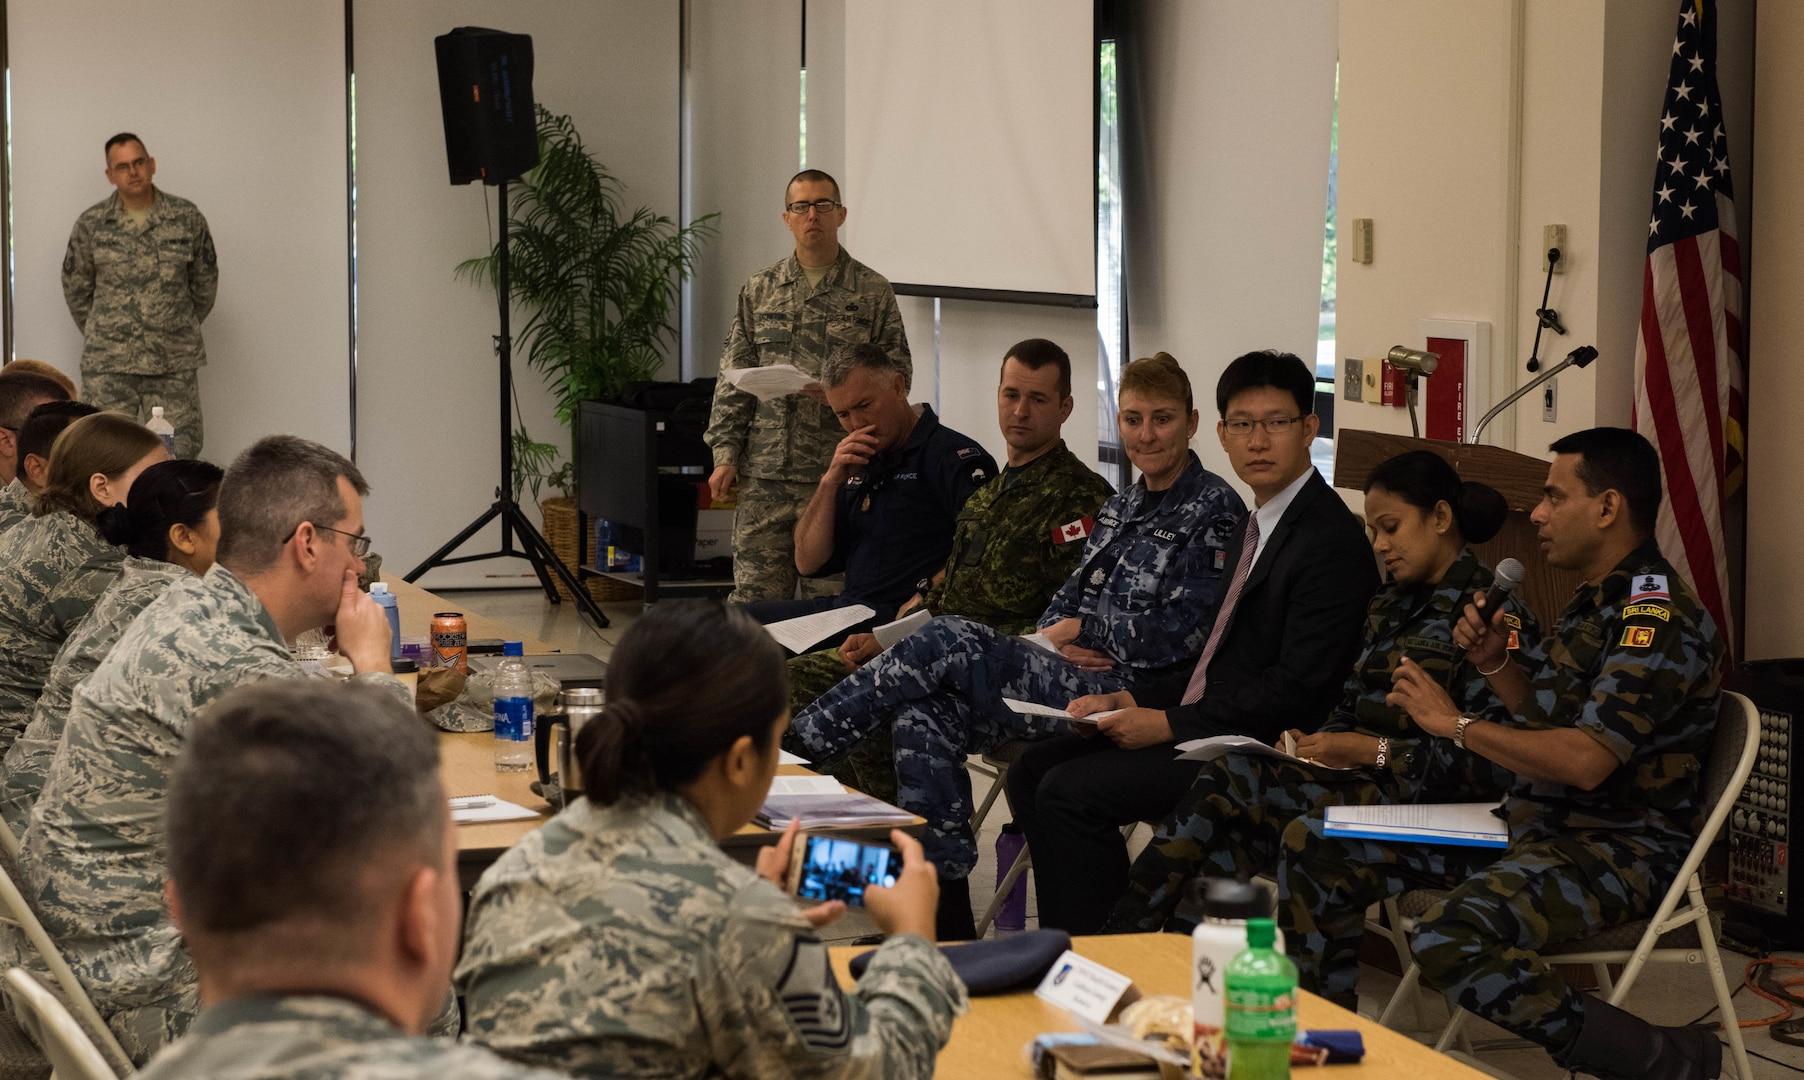 Airmen, International Partners Attend 2018 Team Hickam First Sergeant Symposium